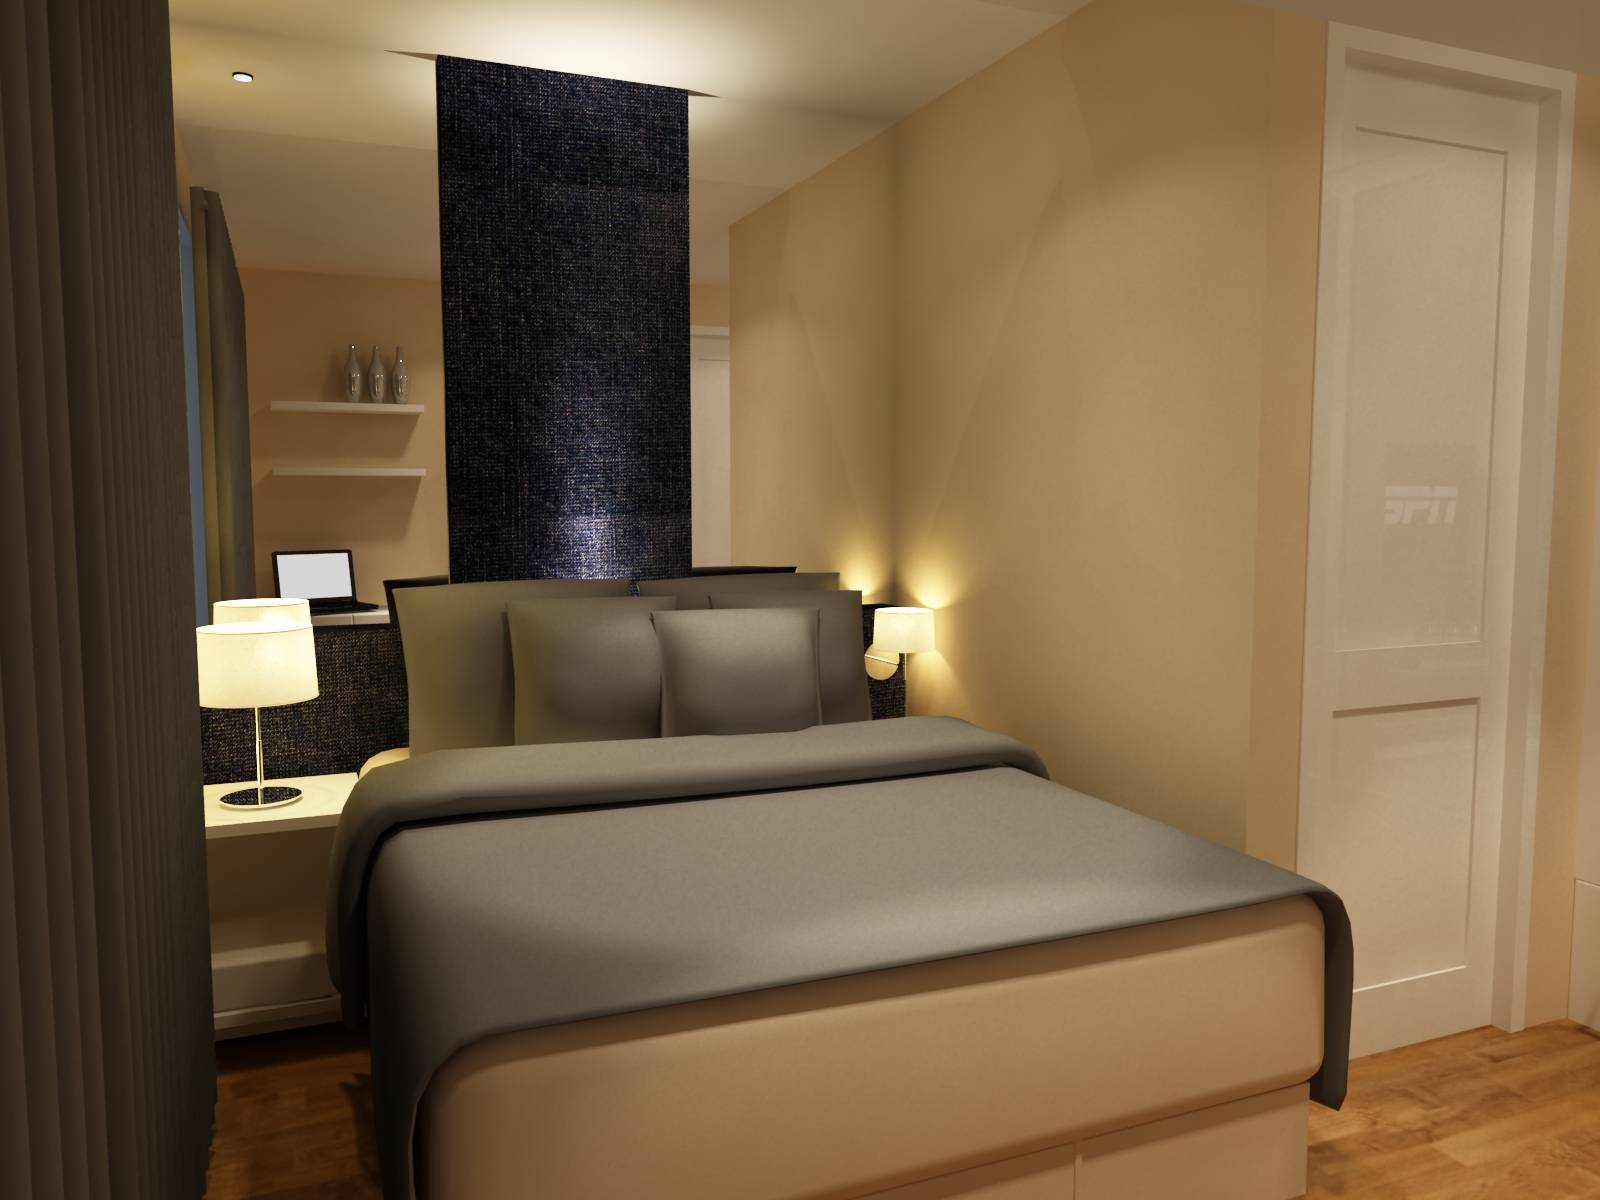 Pt Ergonomi Cipta Karya Private Residence Priuk Jaya Priuk Jaya Priuk Jaya Bedroom   7454